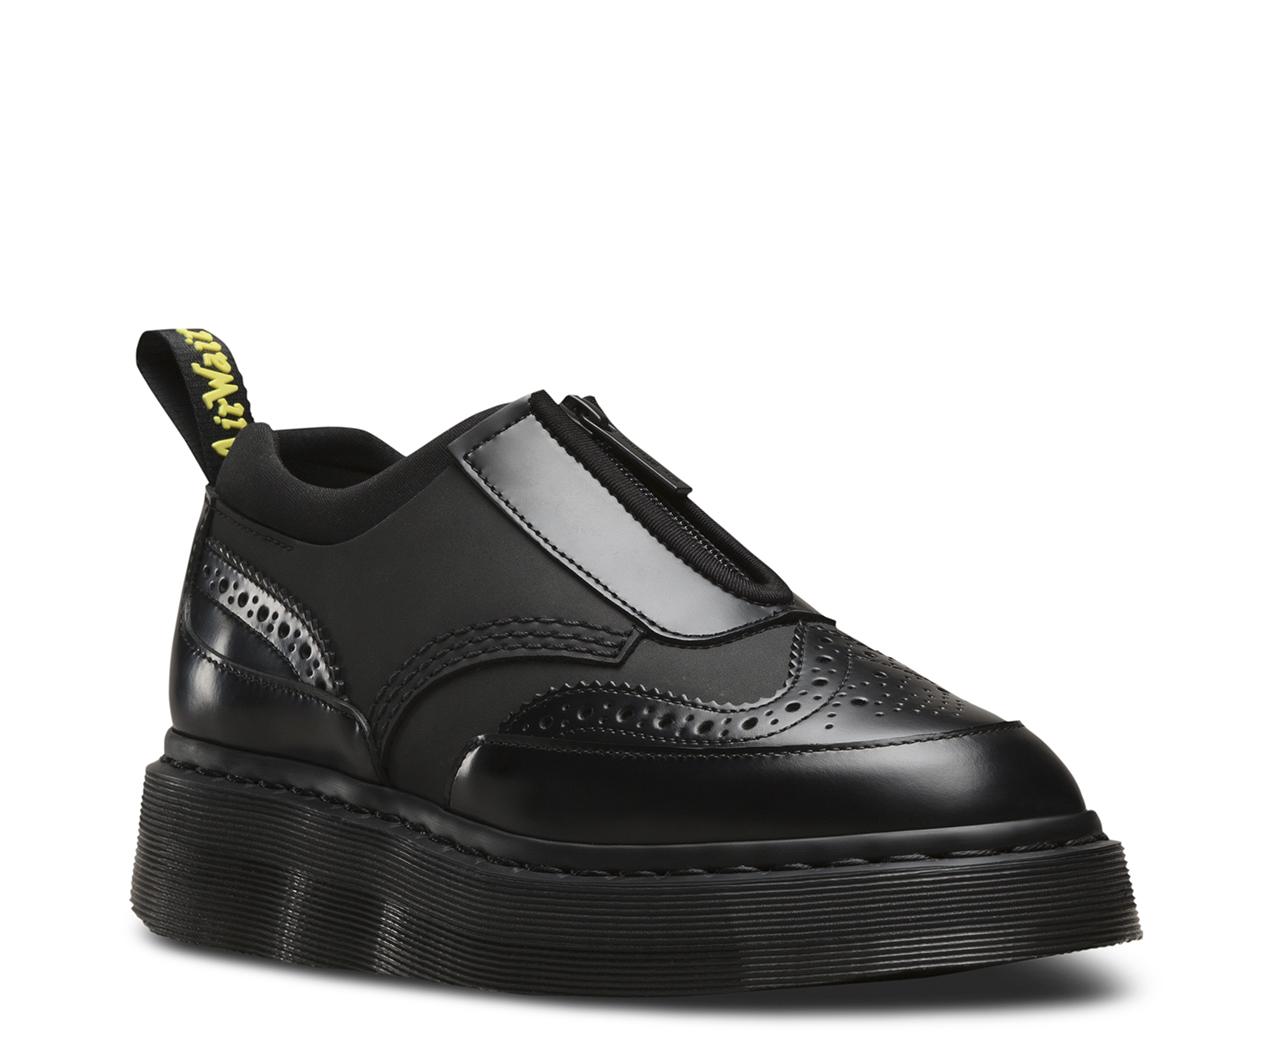 Dr.Martens Womens Resnik Black Leather Shoes 41 EU Dr. Martens Verkauf Erschwinglich qersMrv